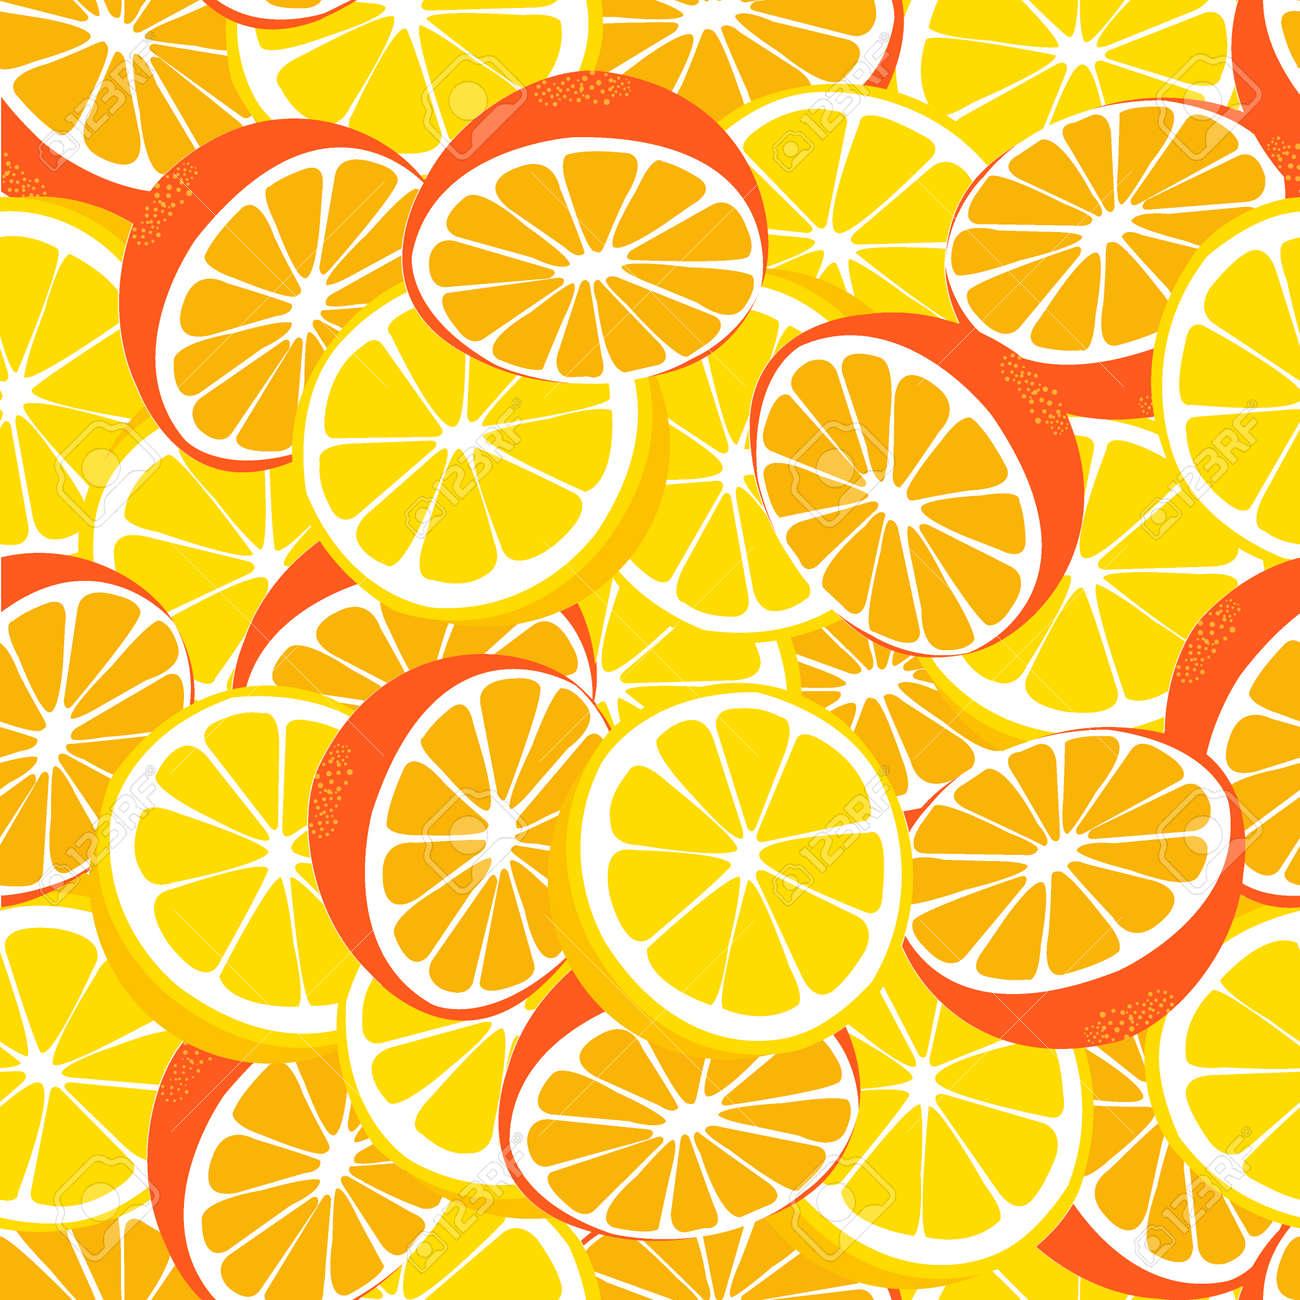 Vettoriale Limone E Arancio Limonata Seamless Lemonade Sfondo